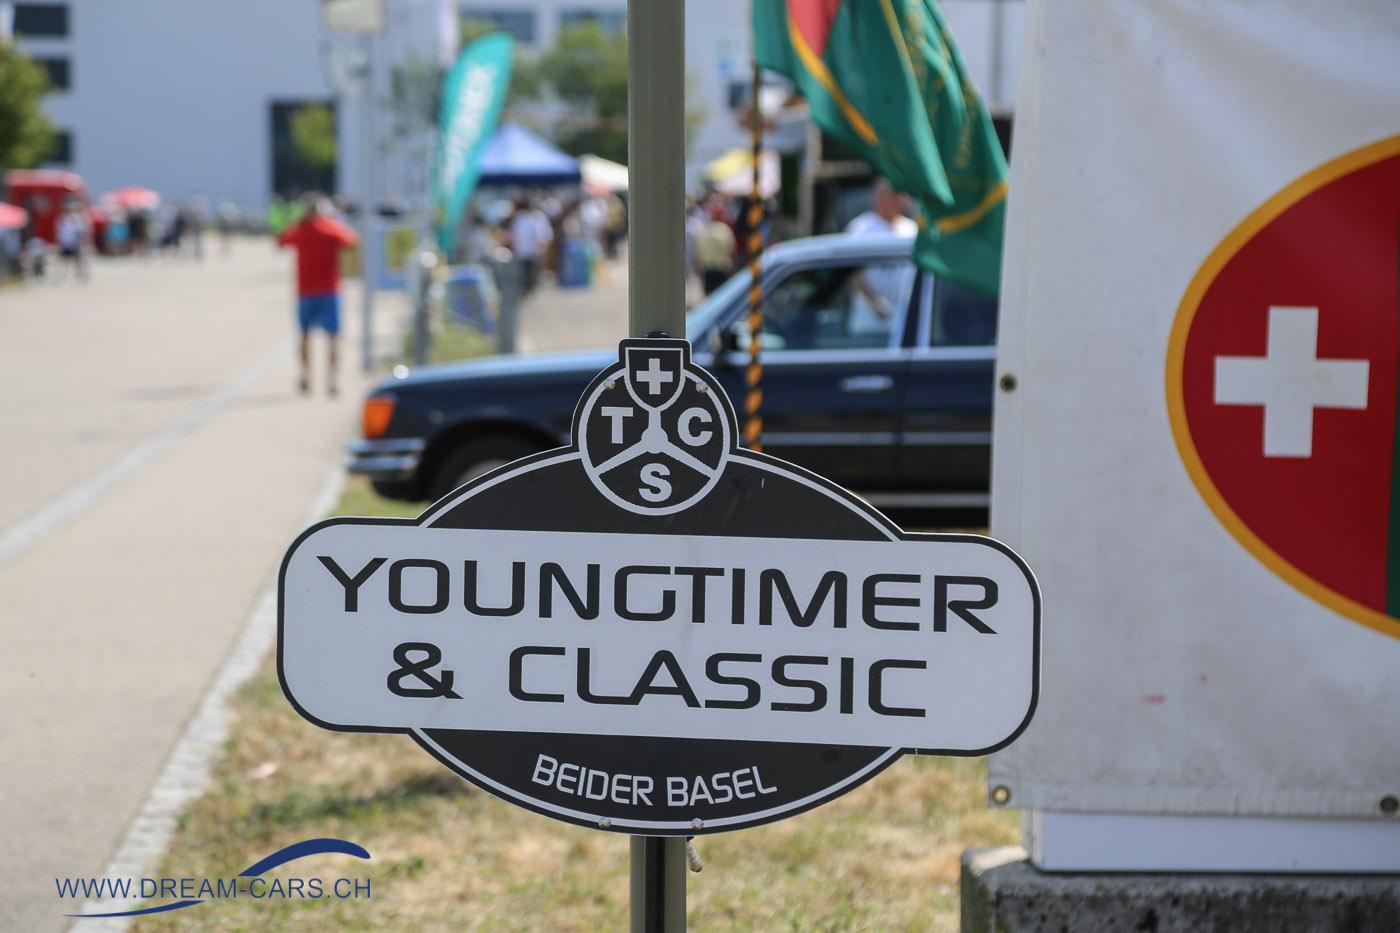 Youngtimer & Classic Pratteln, 14.07.2018